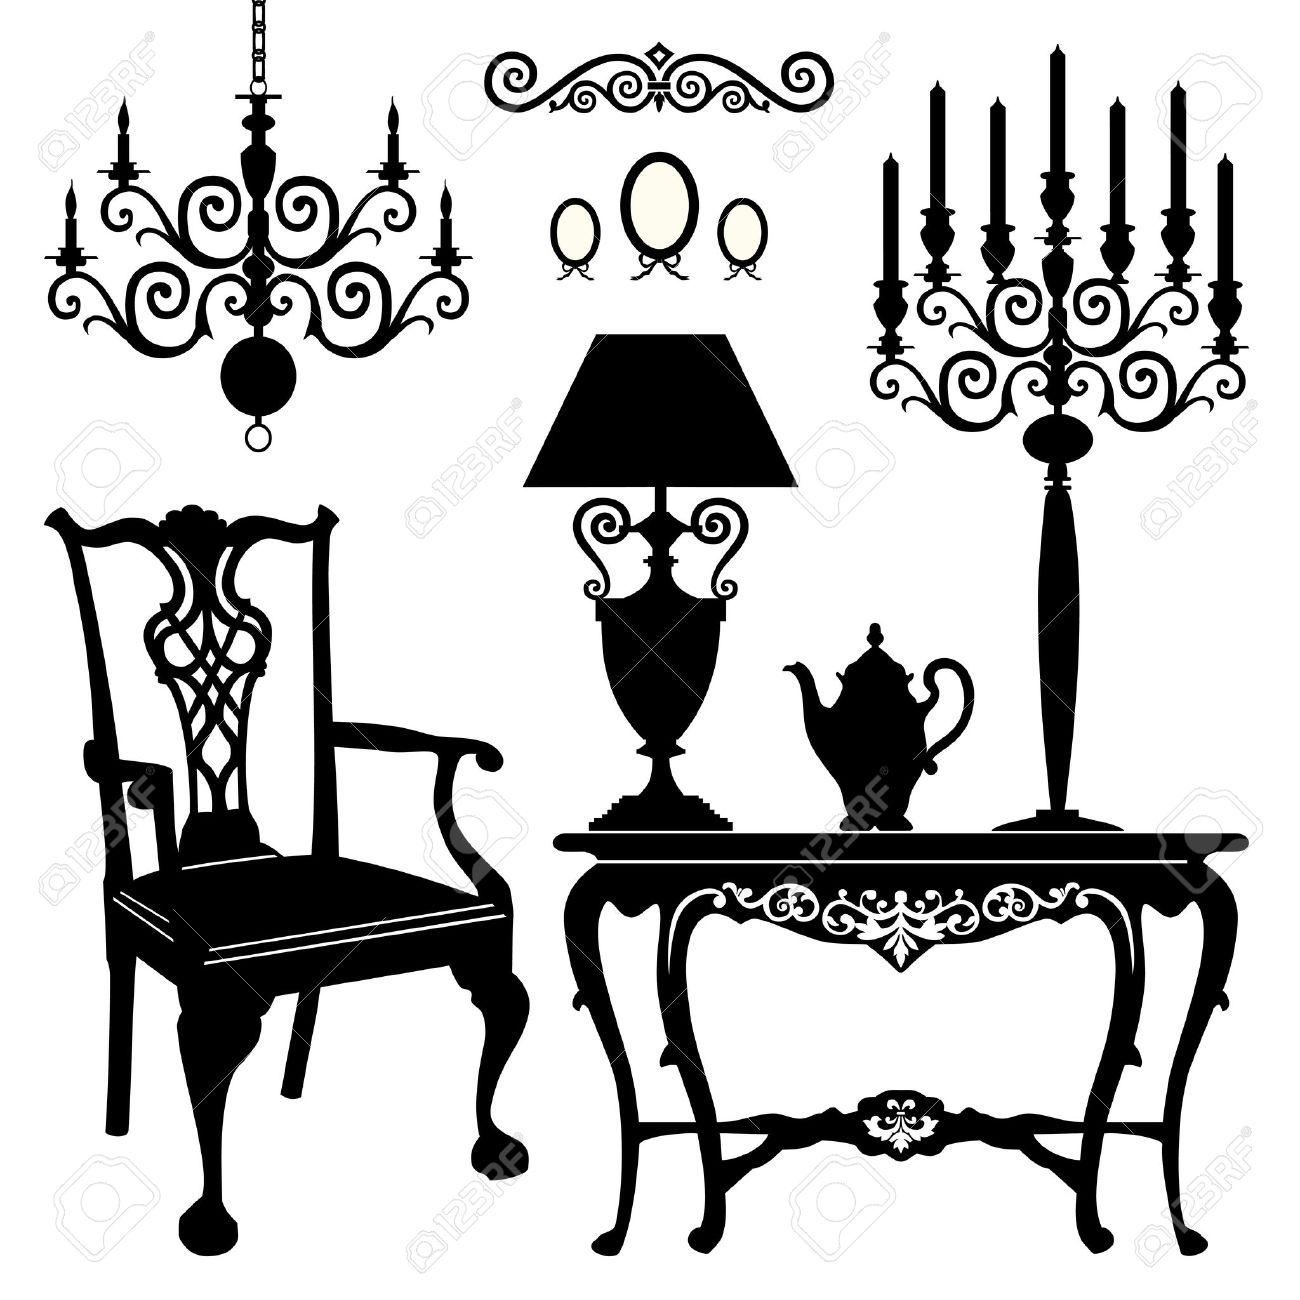 Antique chair silhouette - Antique Furniture Stock Vector 11585099